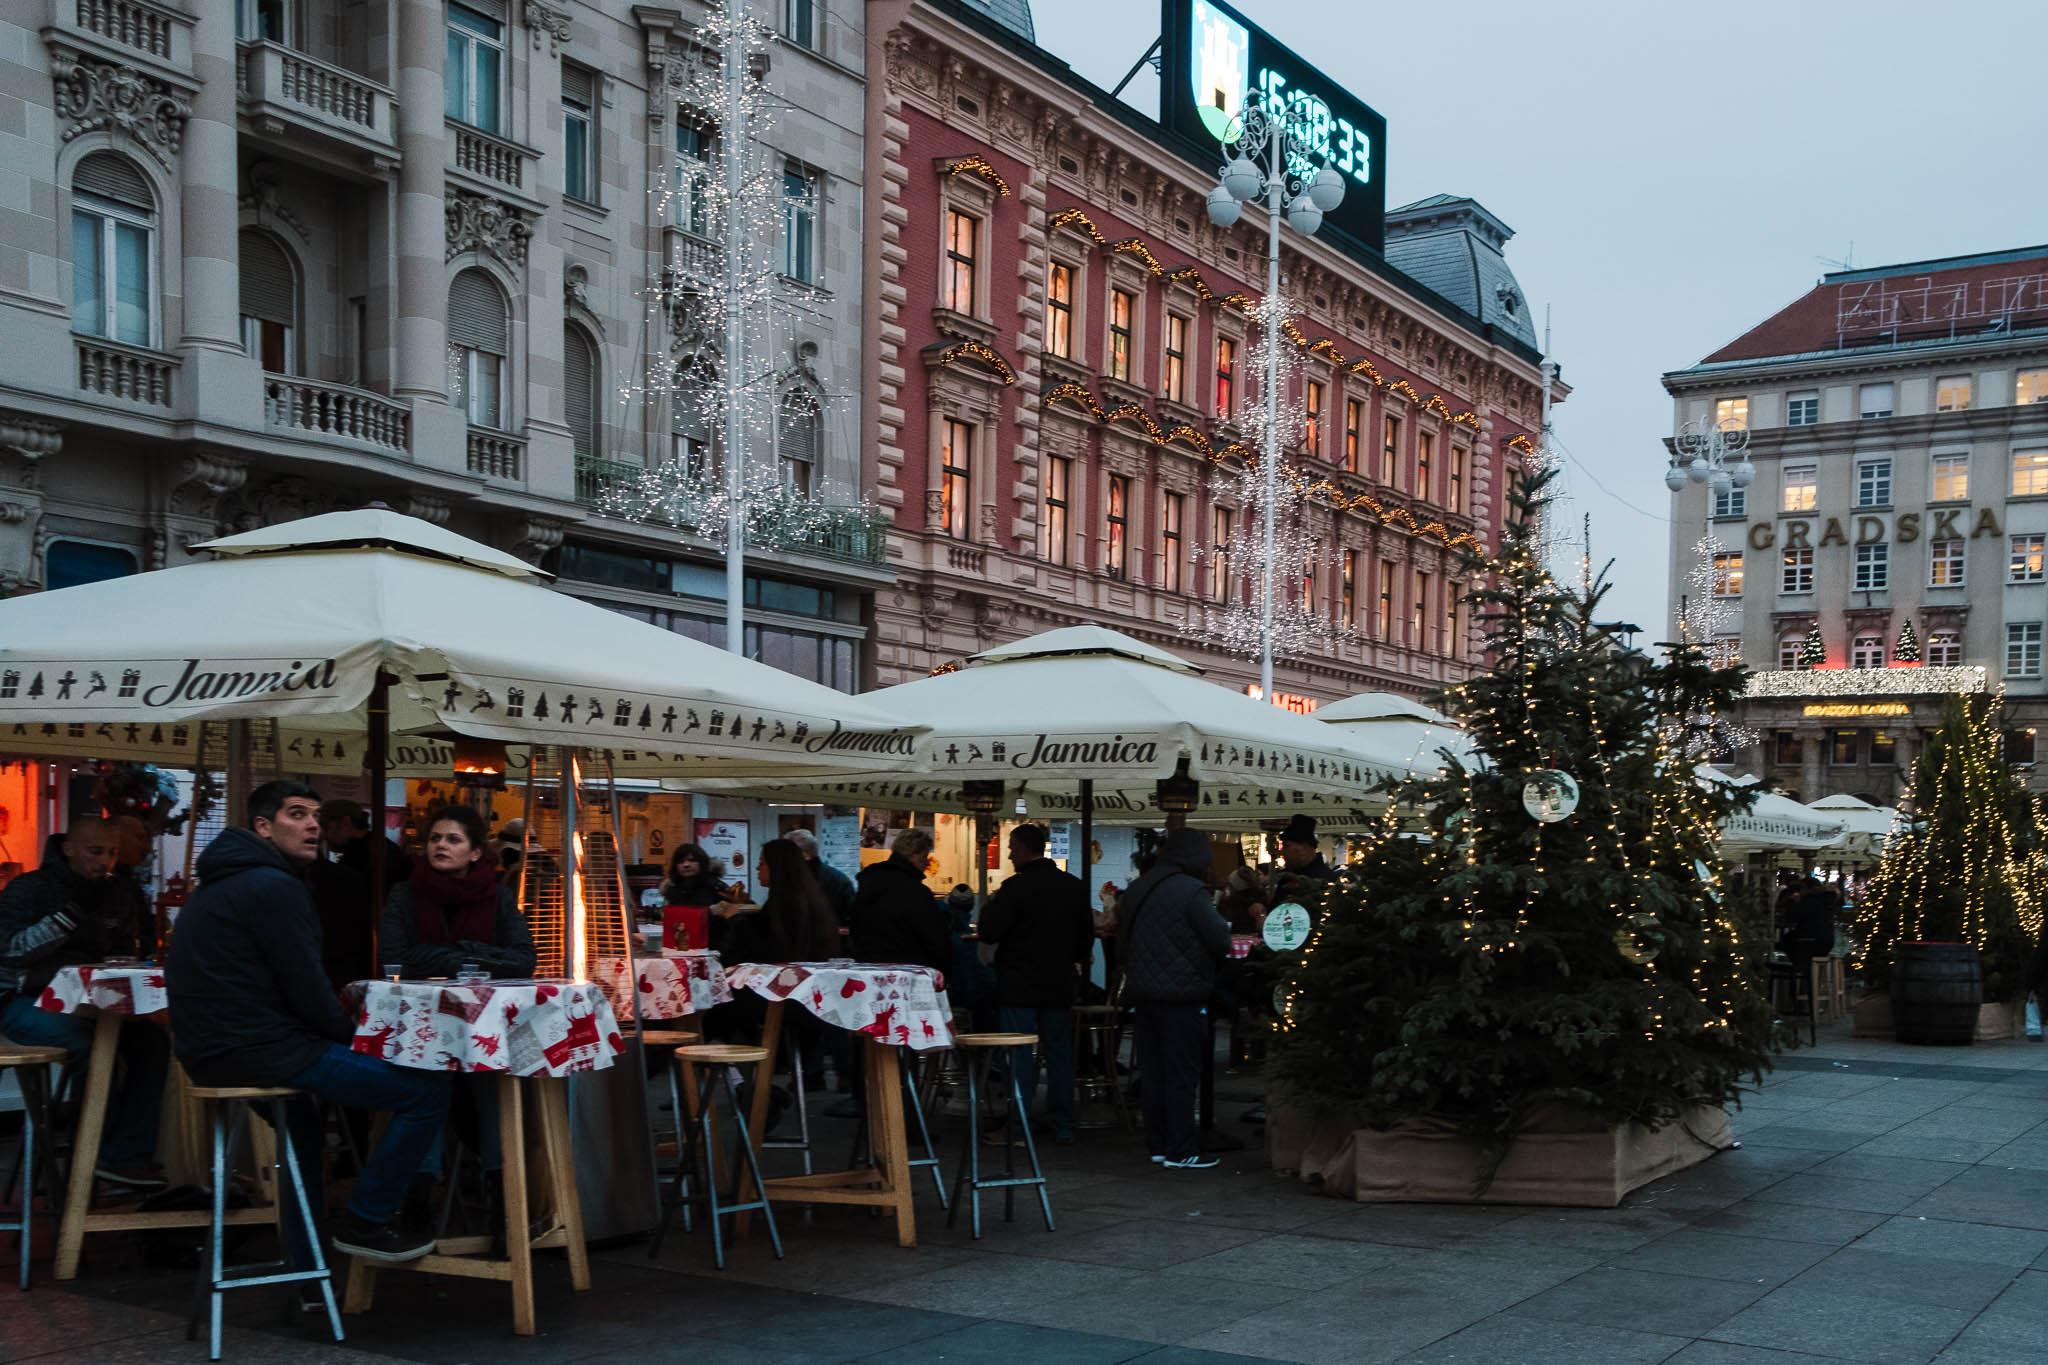 christmas markets in zagreb